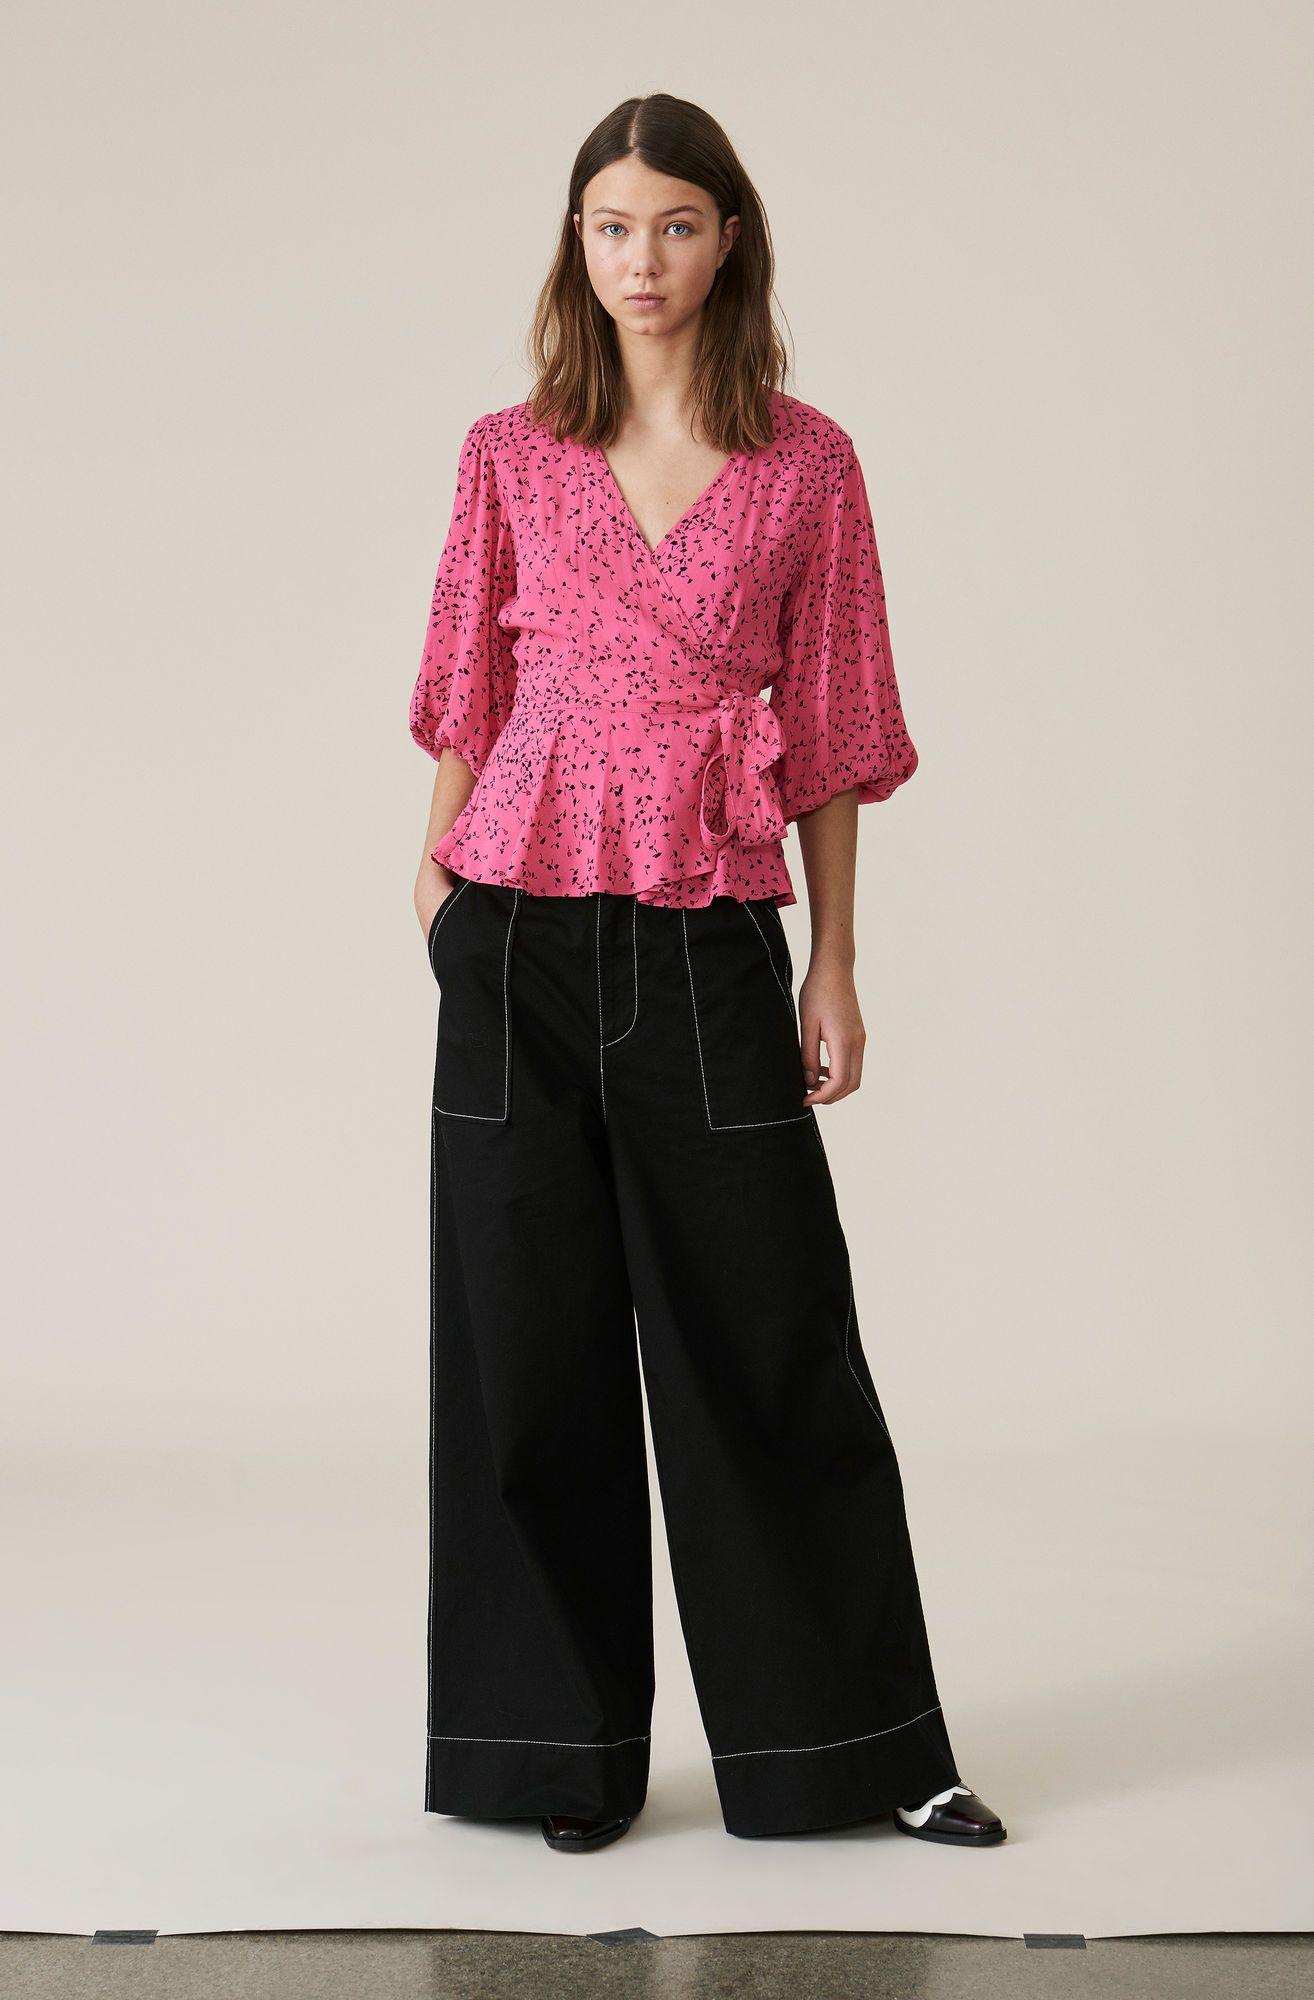 0595e675a8 Barra Crepe Wrap Blouse, Hot Pink | My Style | Wrap blouse, Blouse ...